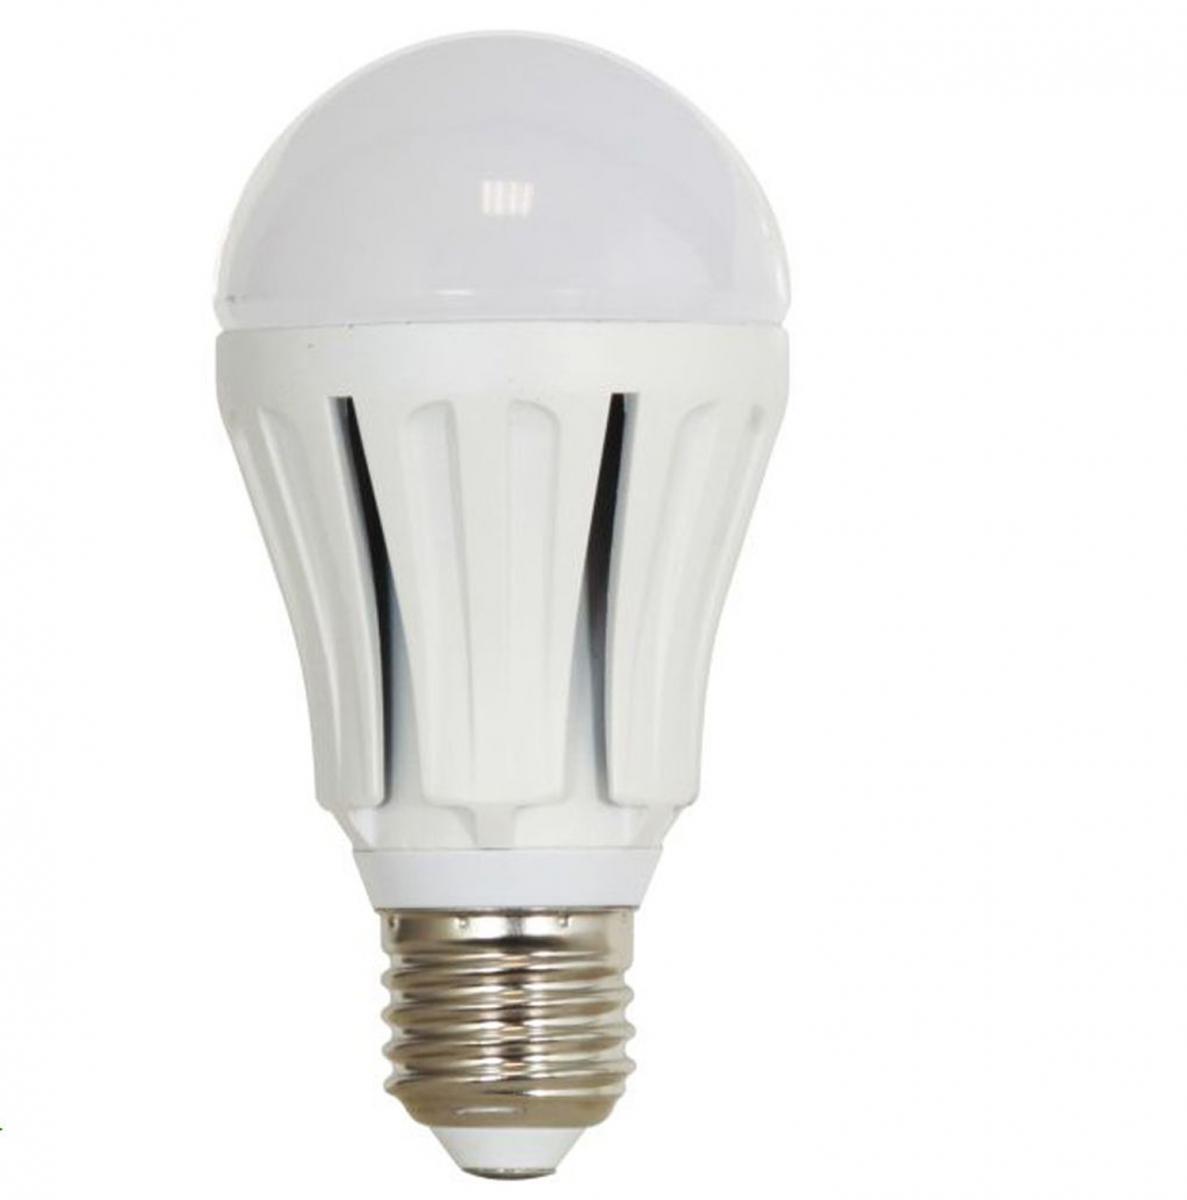 ranex smd led leuchtmittel mit e27 fassung 7 watt xq1273 energieklasse a. Black Bedroom Furniture Sets. Home Design Ideas